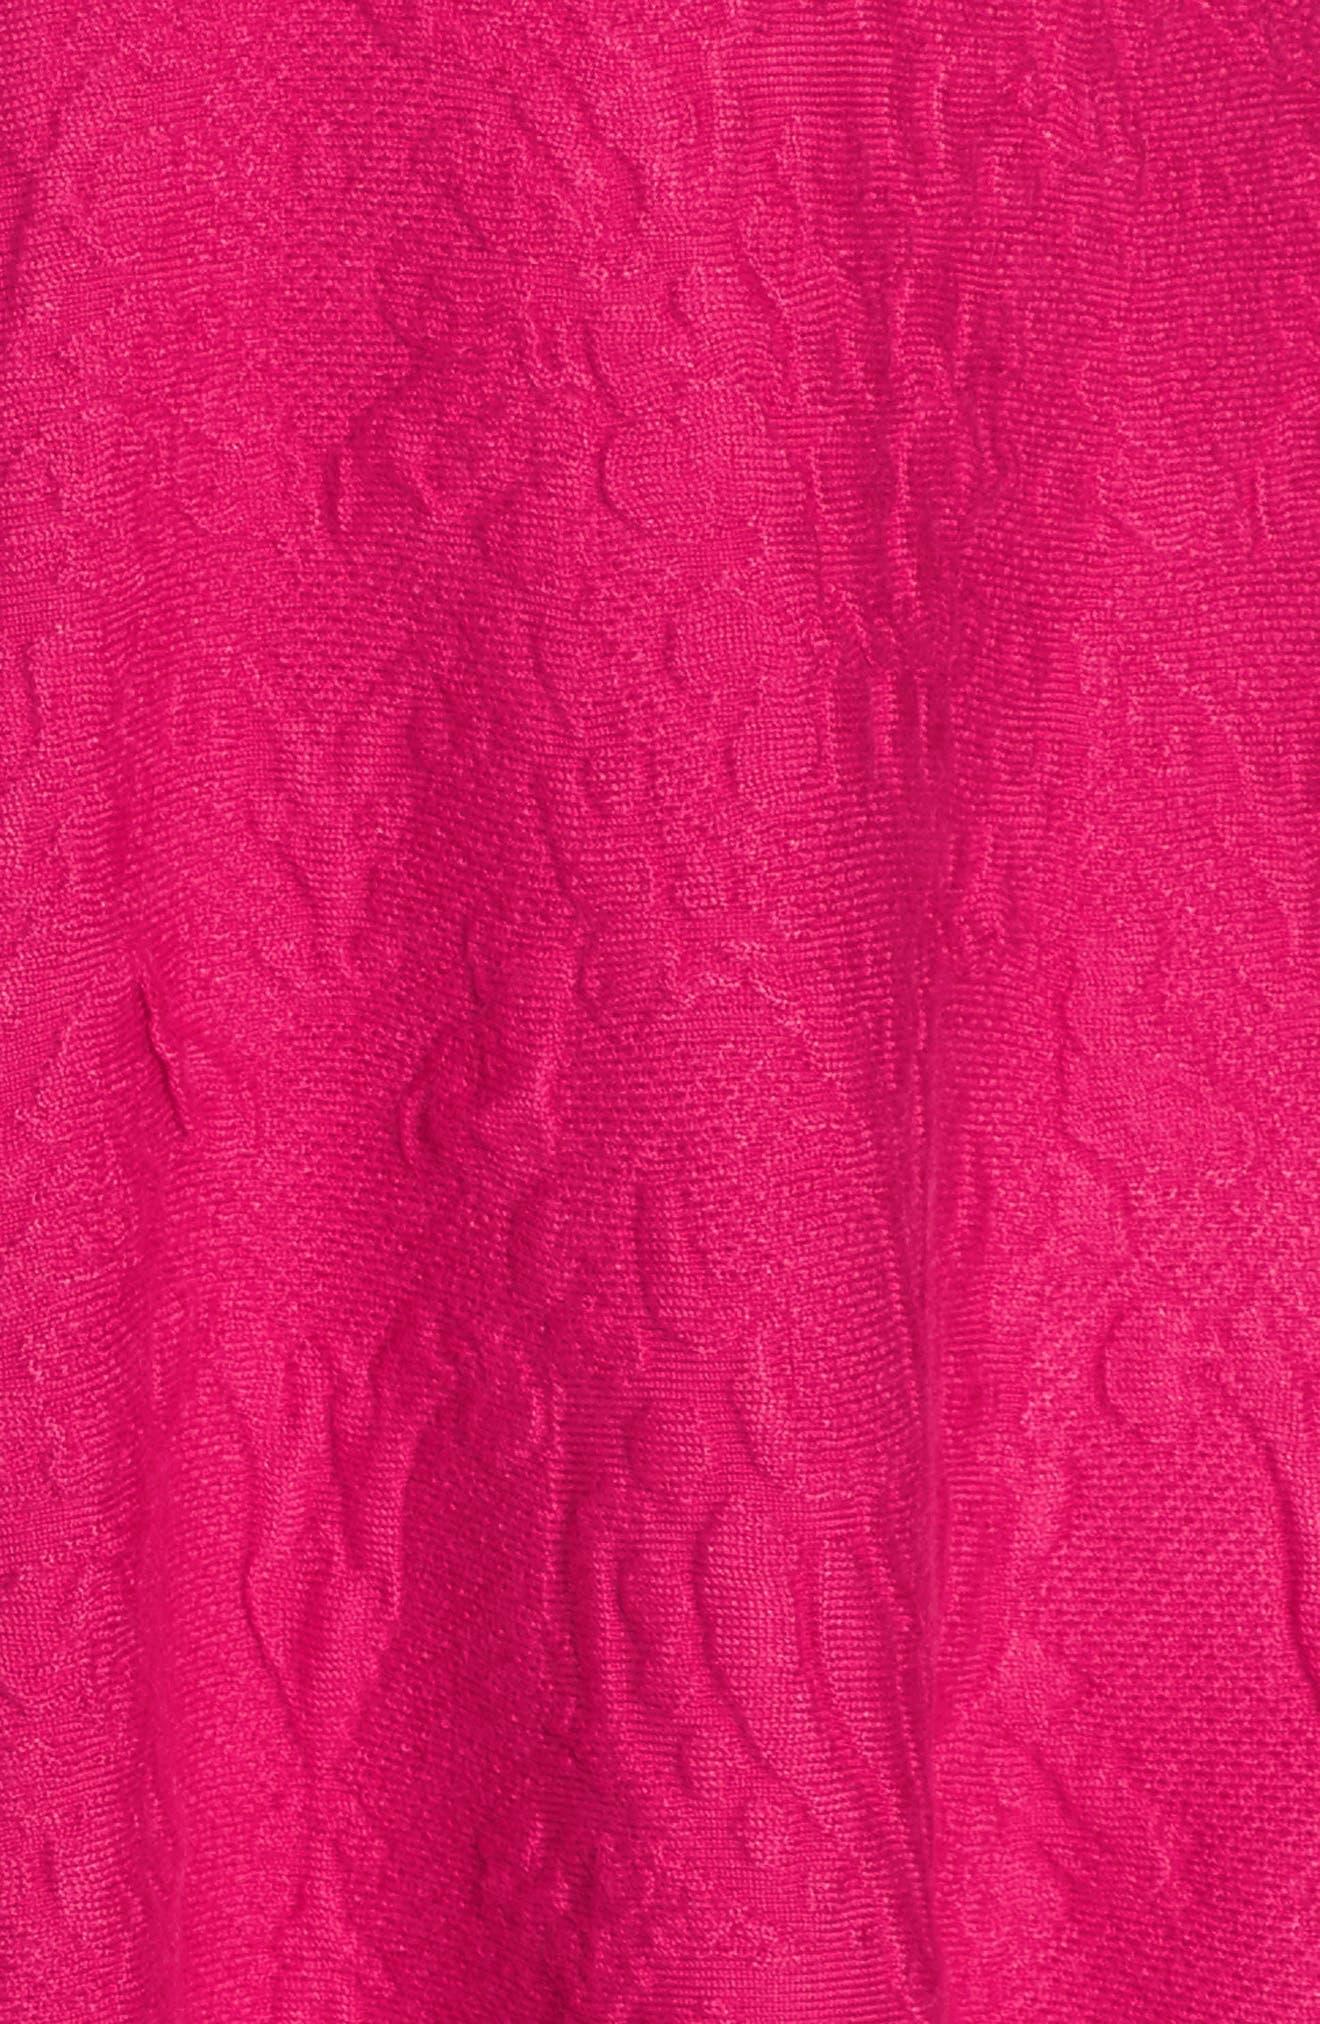 Texture Knit Fit & Flare Dress,                             Alternate thumbnail 6, color,                             660